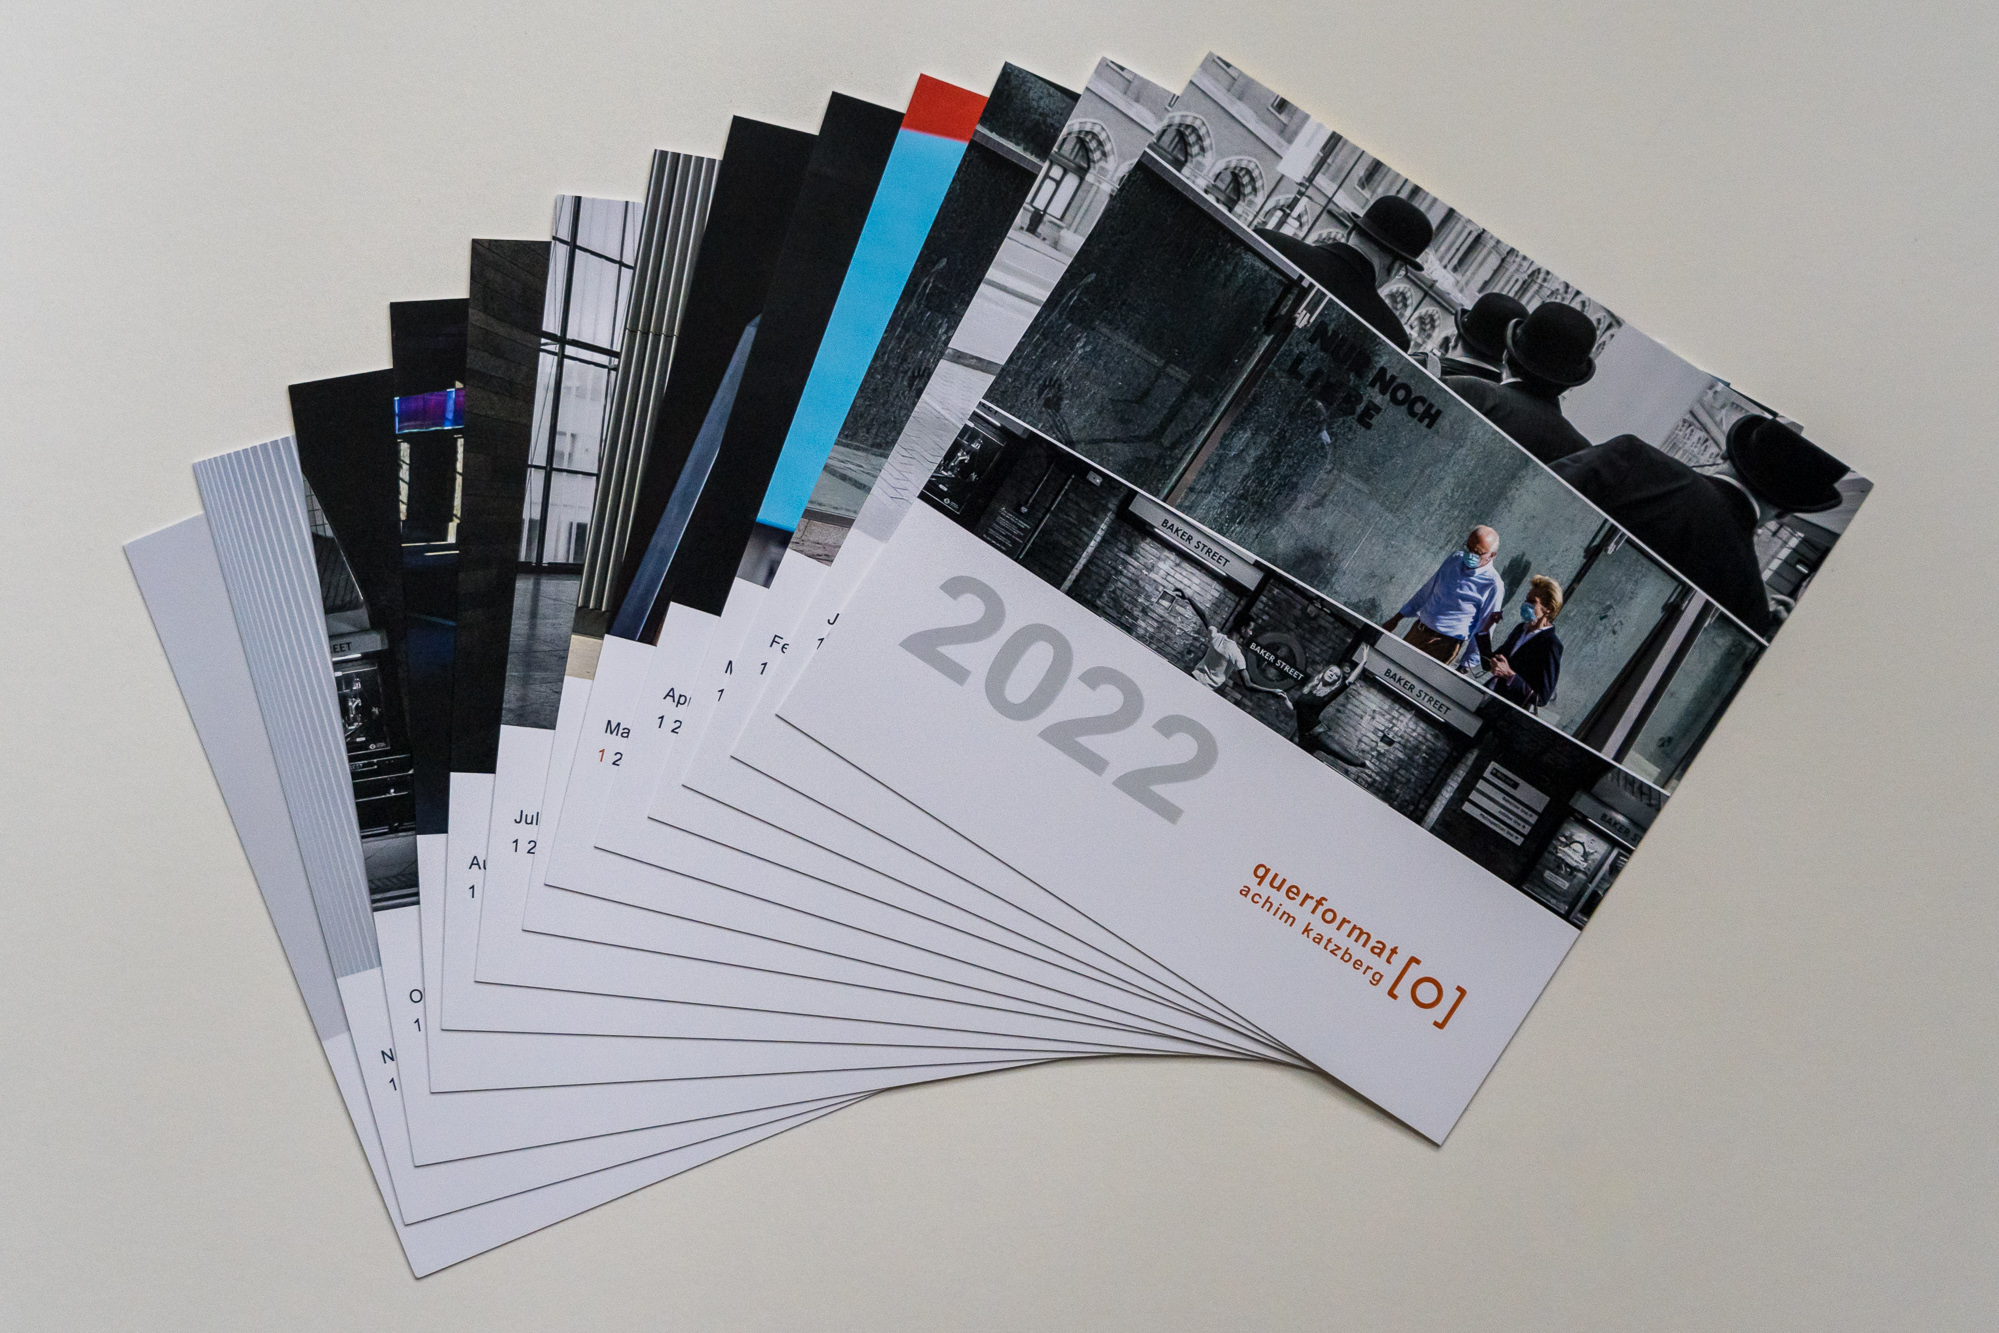 querformat-fotografie - Achim Katzberg - querformat-fotografie Kalender 2021 - querformat-fotografie_Kalender_2022-001